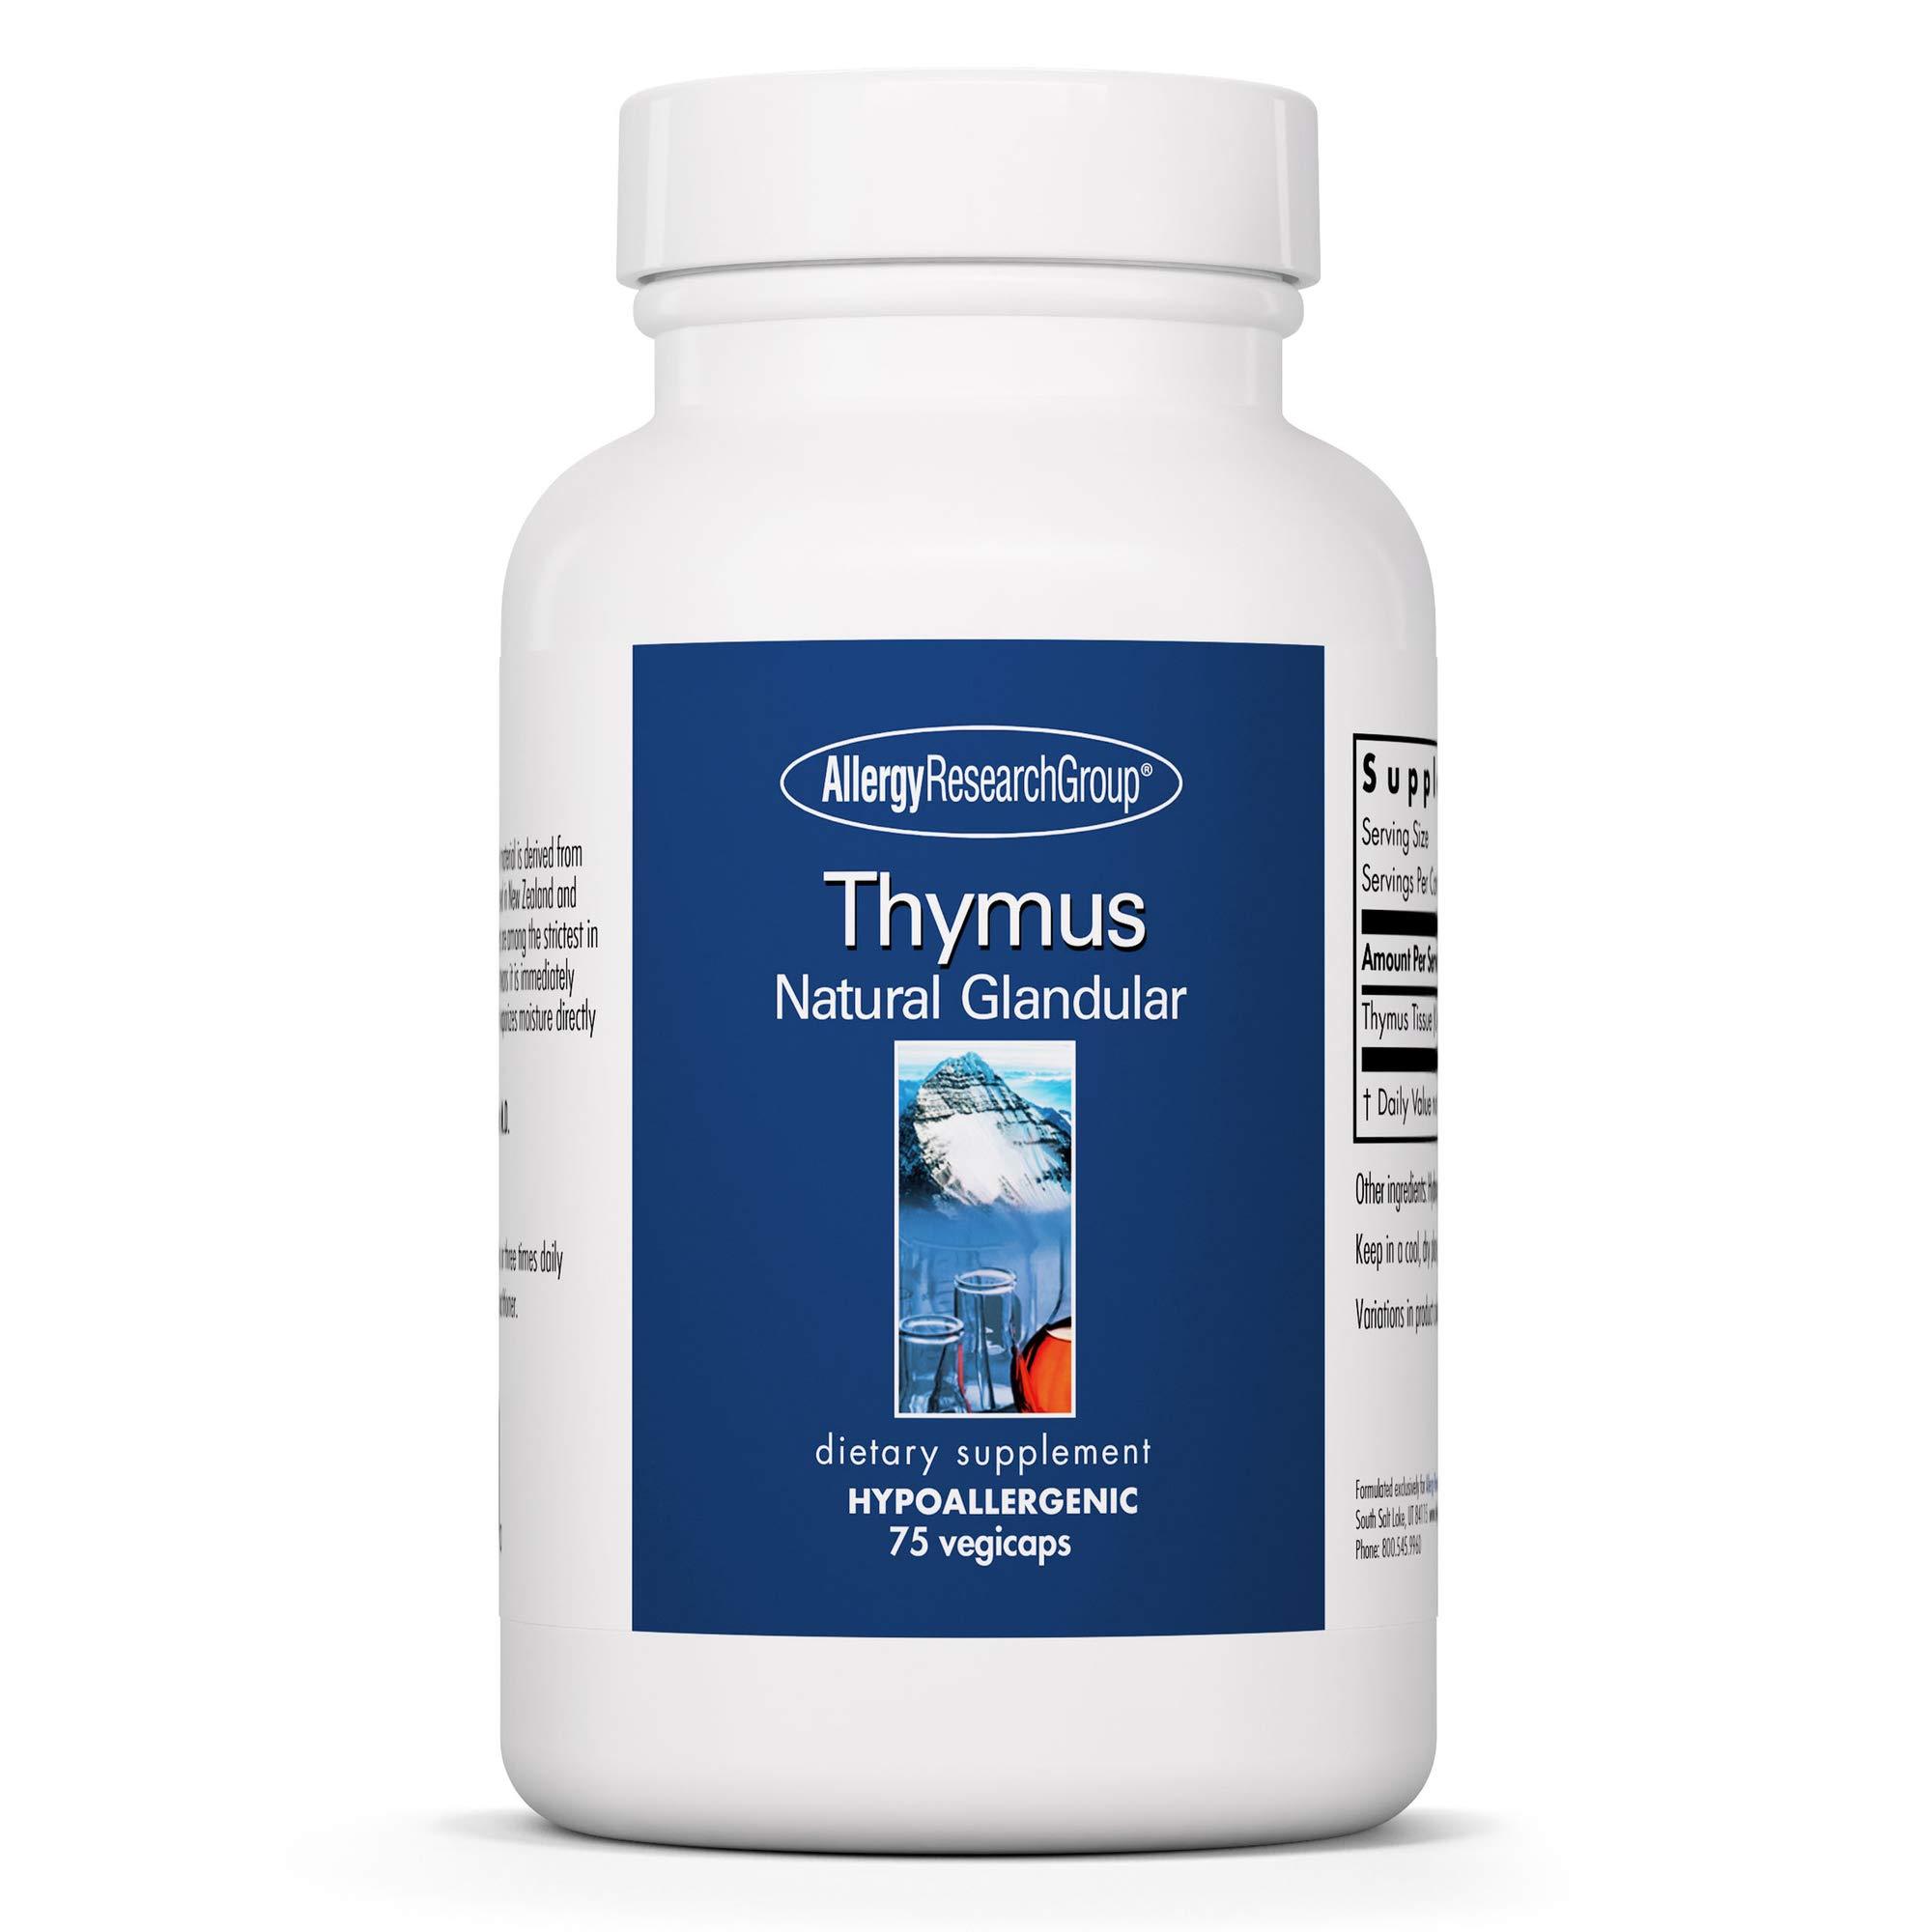 Allergy Research Group - Thymus - Natural Glandular, Immune Support - 75 Vegicaps